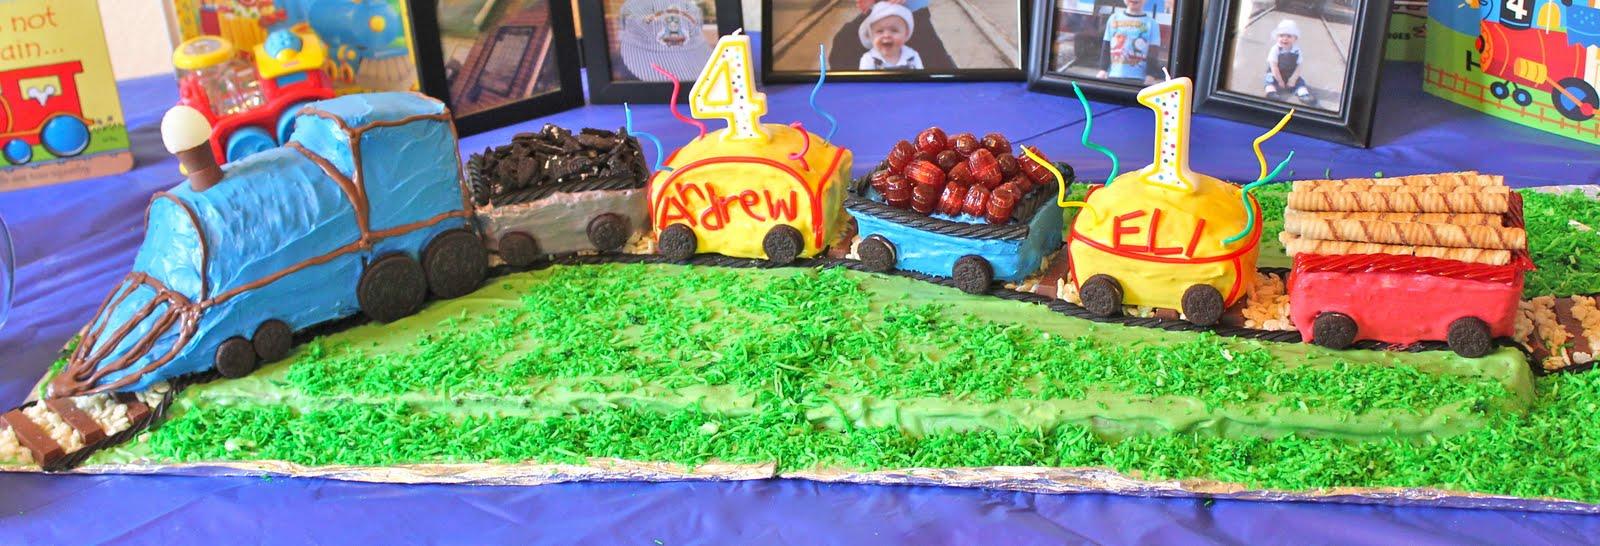 Train Cake Tutorial